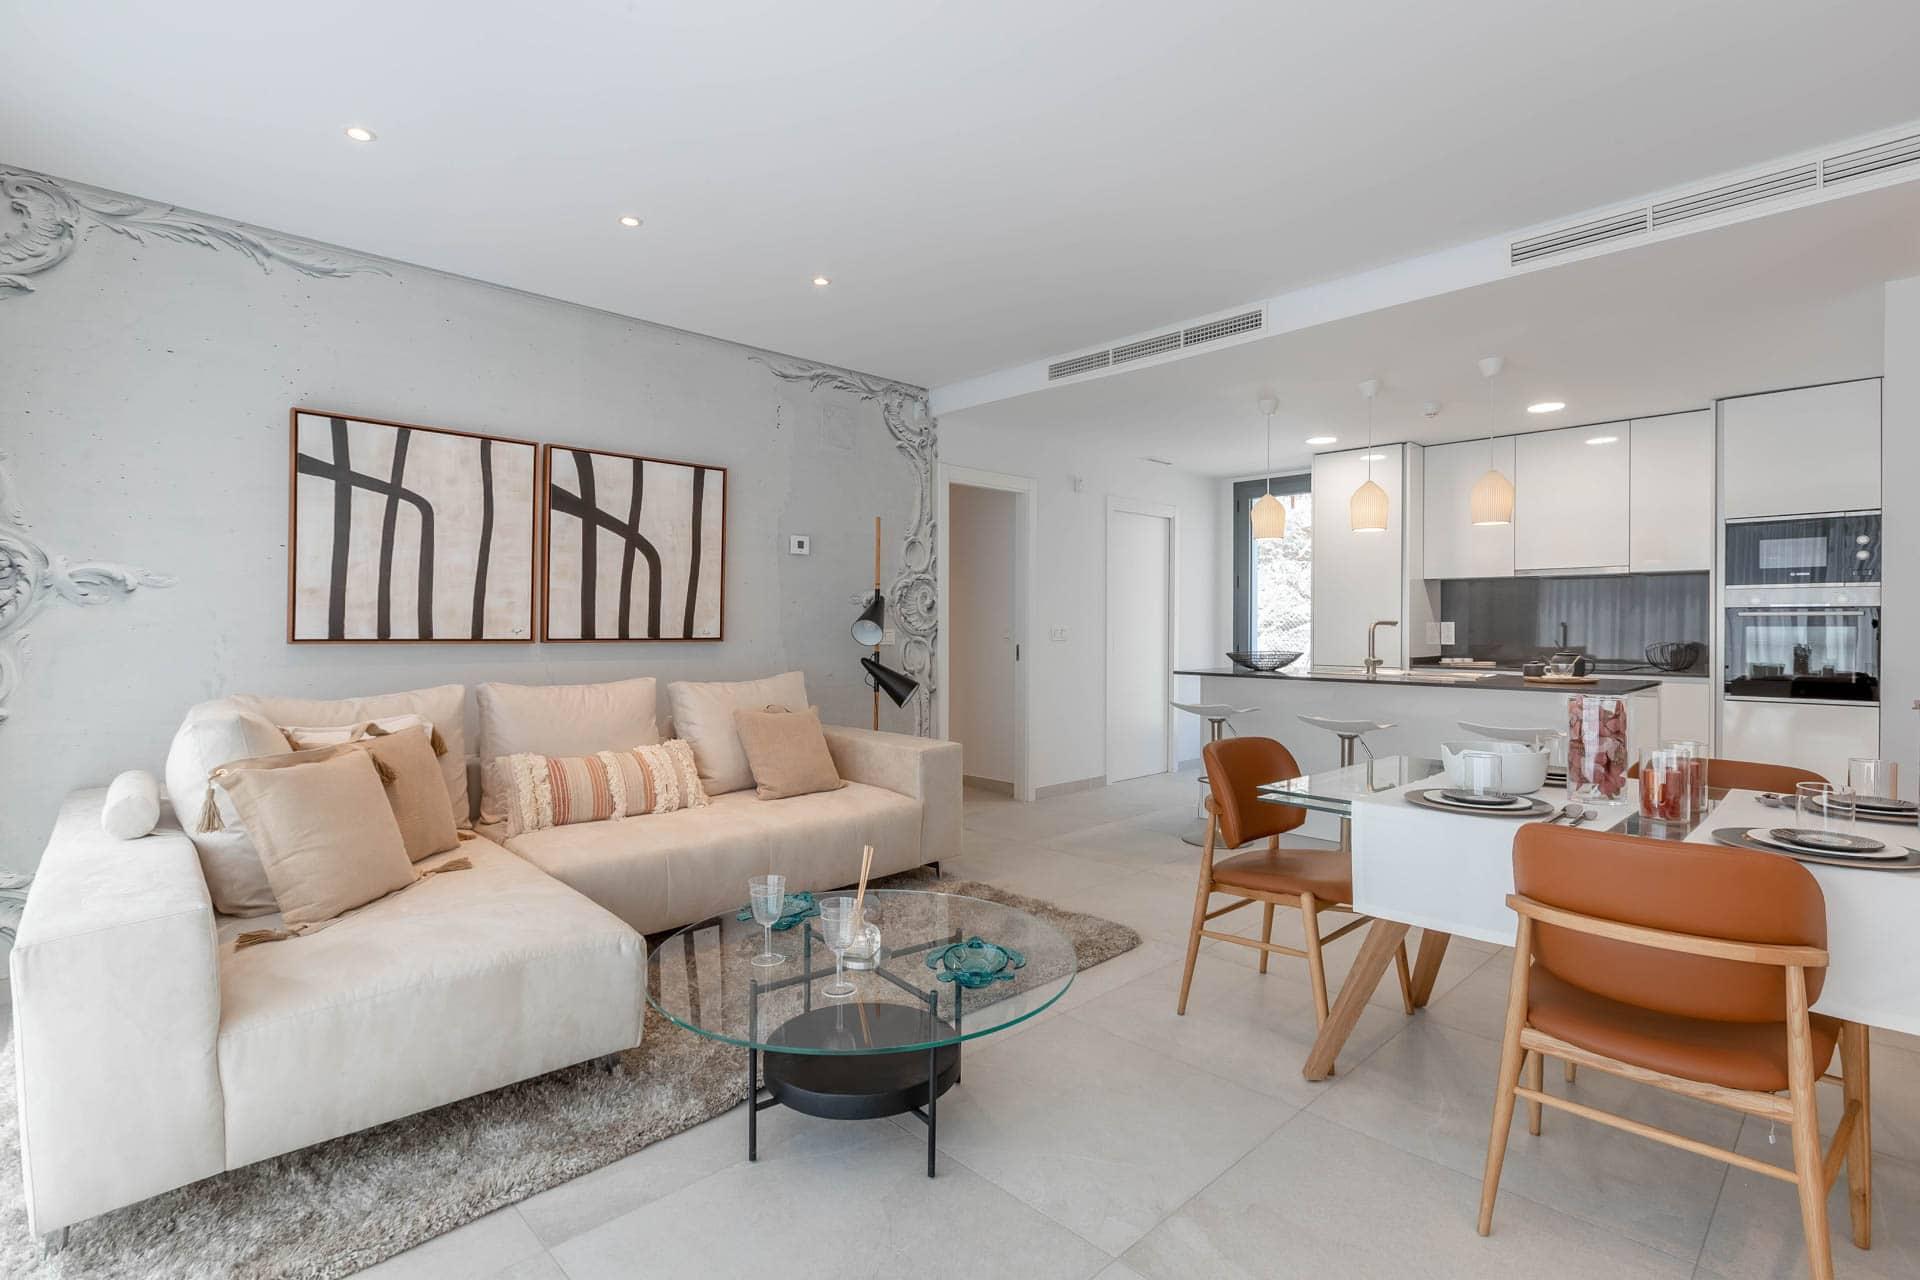 10 - Living Room 2 - Alborada Homes - Full Res